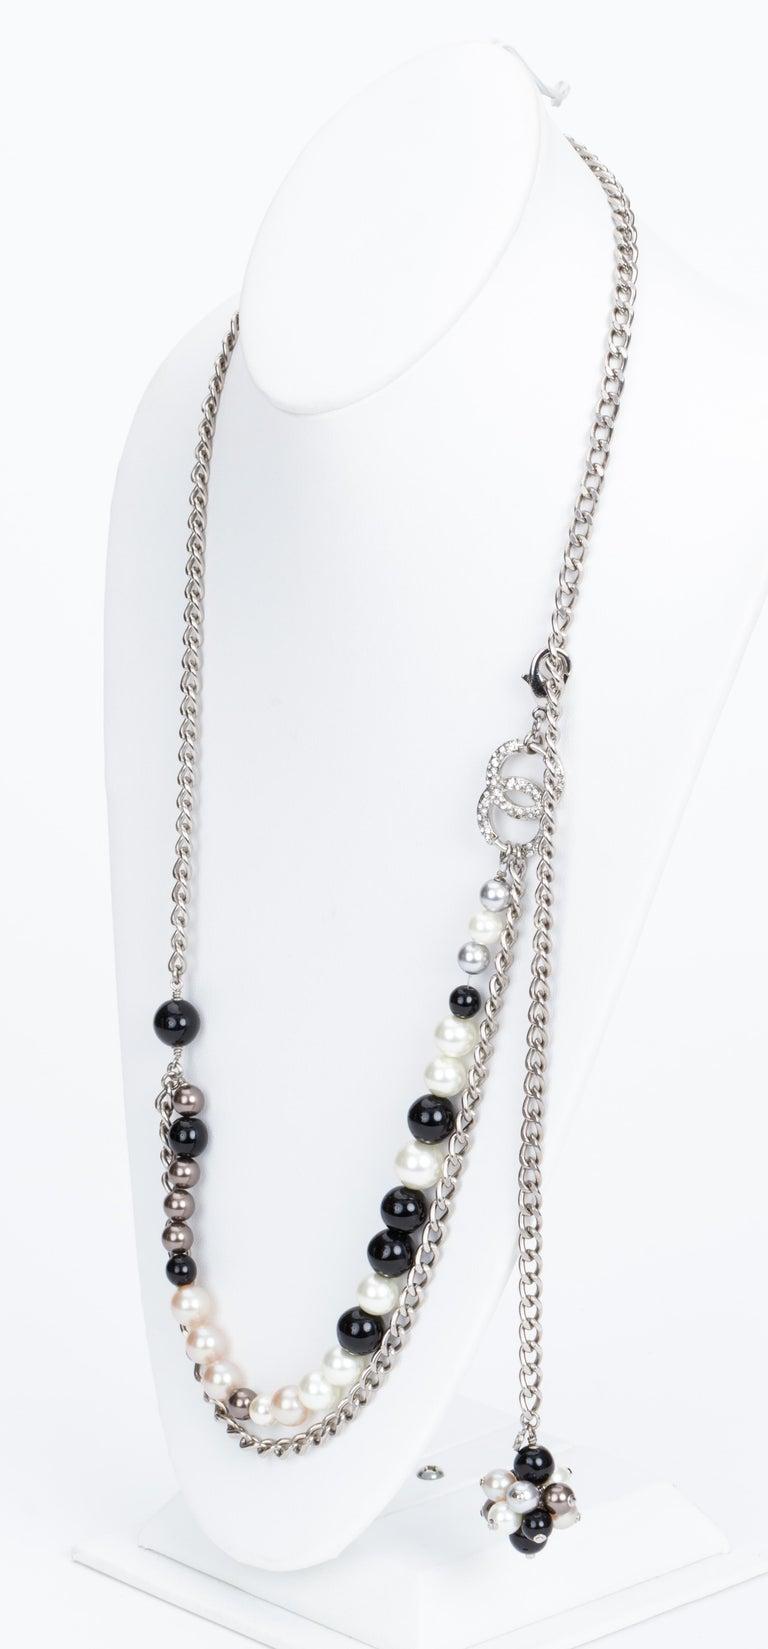 Chanel Black & White Pearl Necklace Belt 2